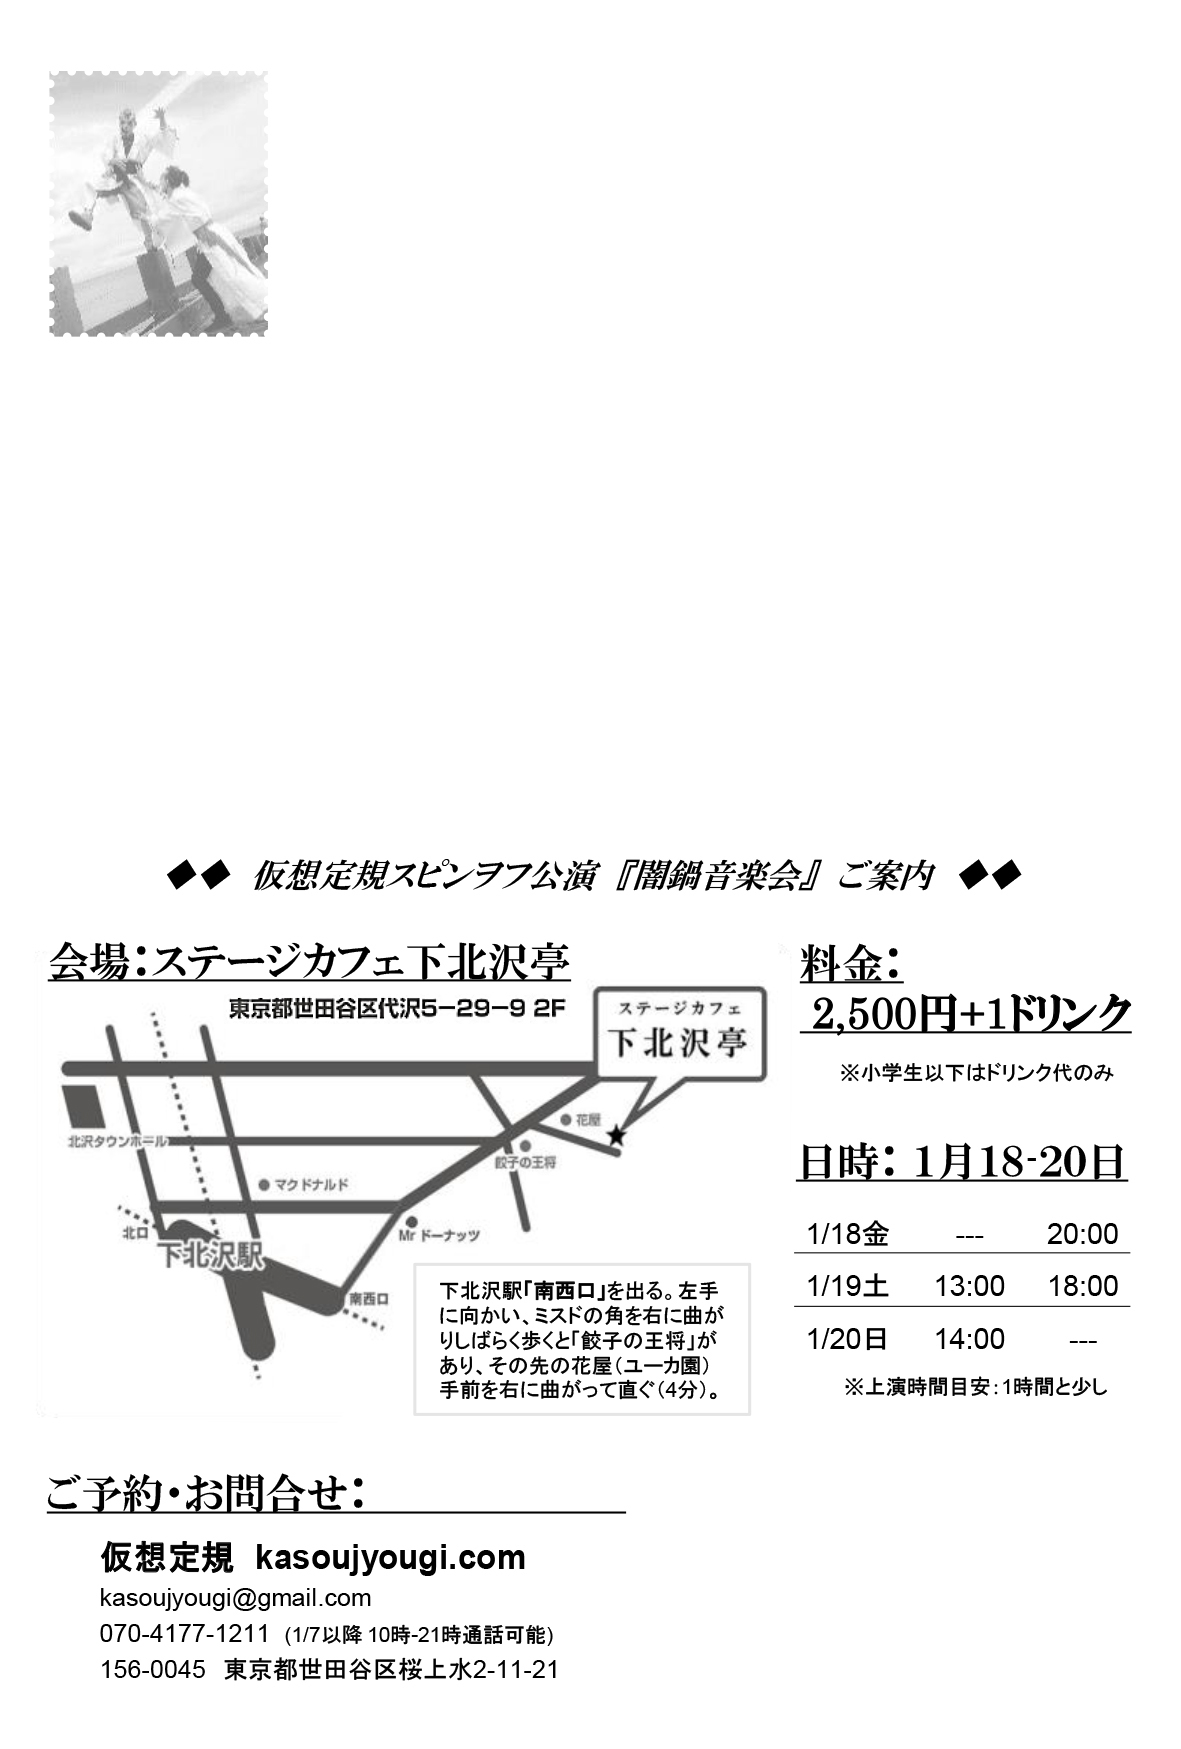 仮想定規スピンヲフ公演「闇鍋音楽会」:1/18~1/20_d0388376_20161604.jpg